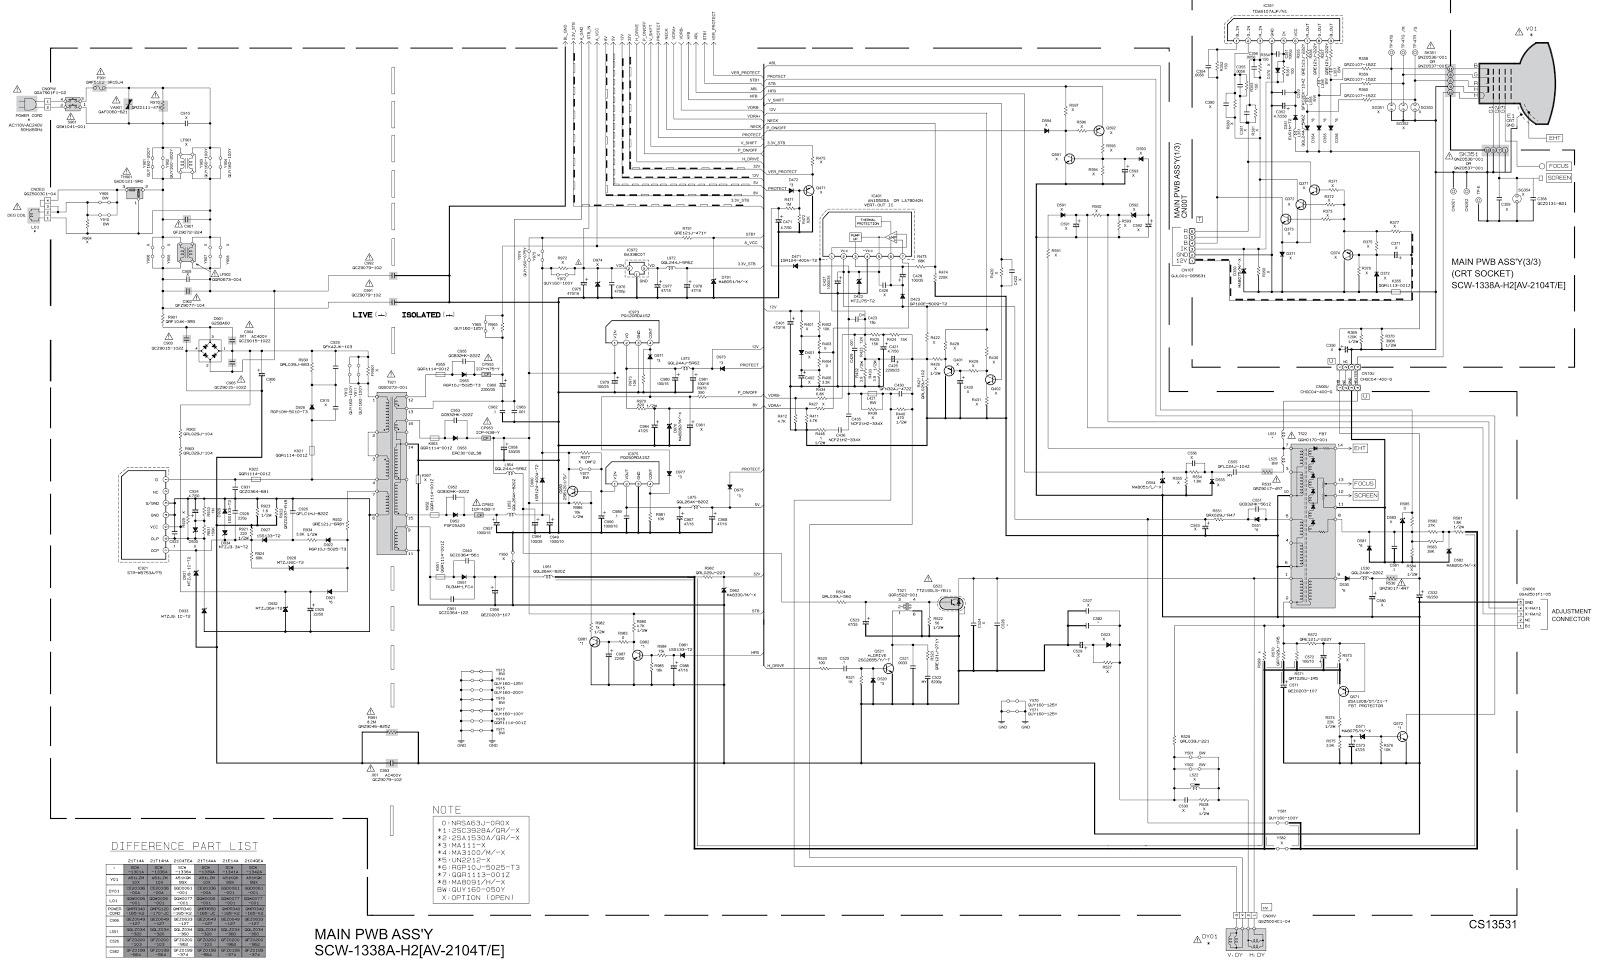 medium resolution of jvc tv diagram everything about wiring diagram u2022 rh calsignsolutions com jvc tv circuit diagram circuit diagram for a television